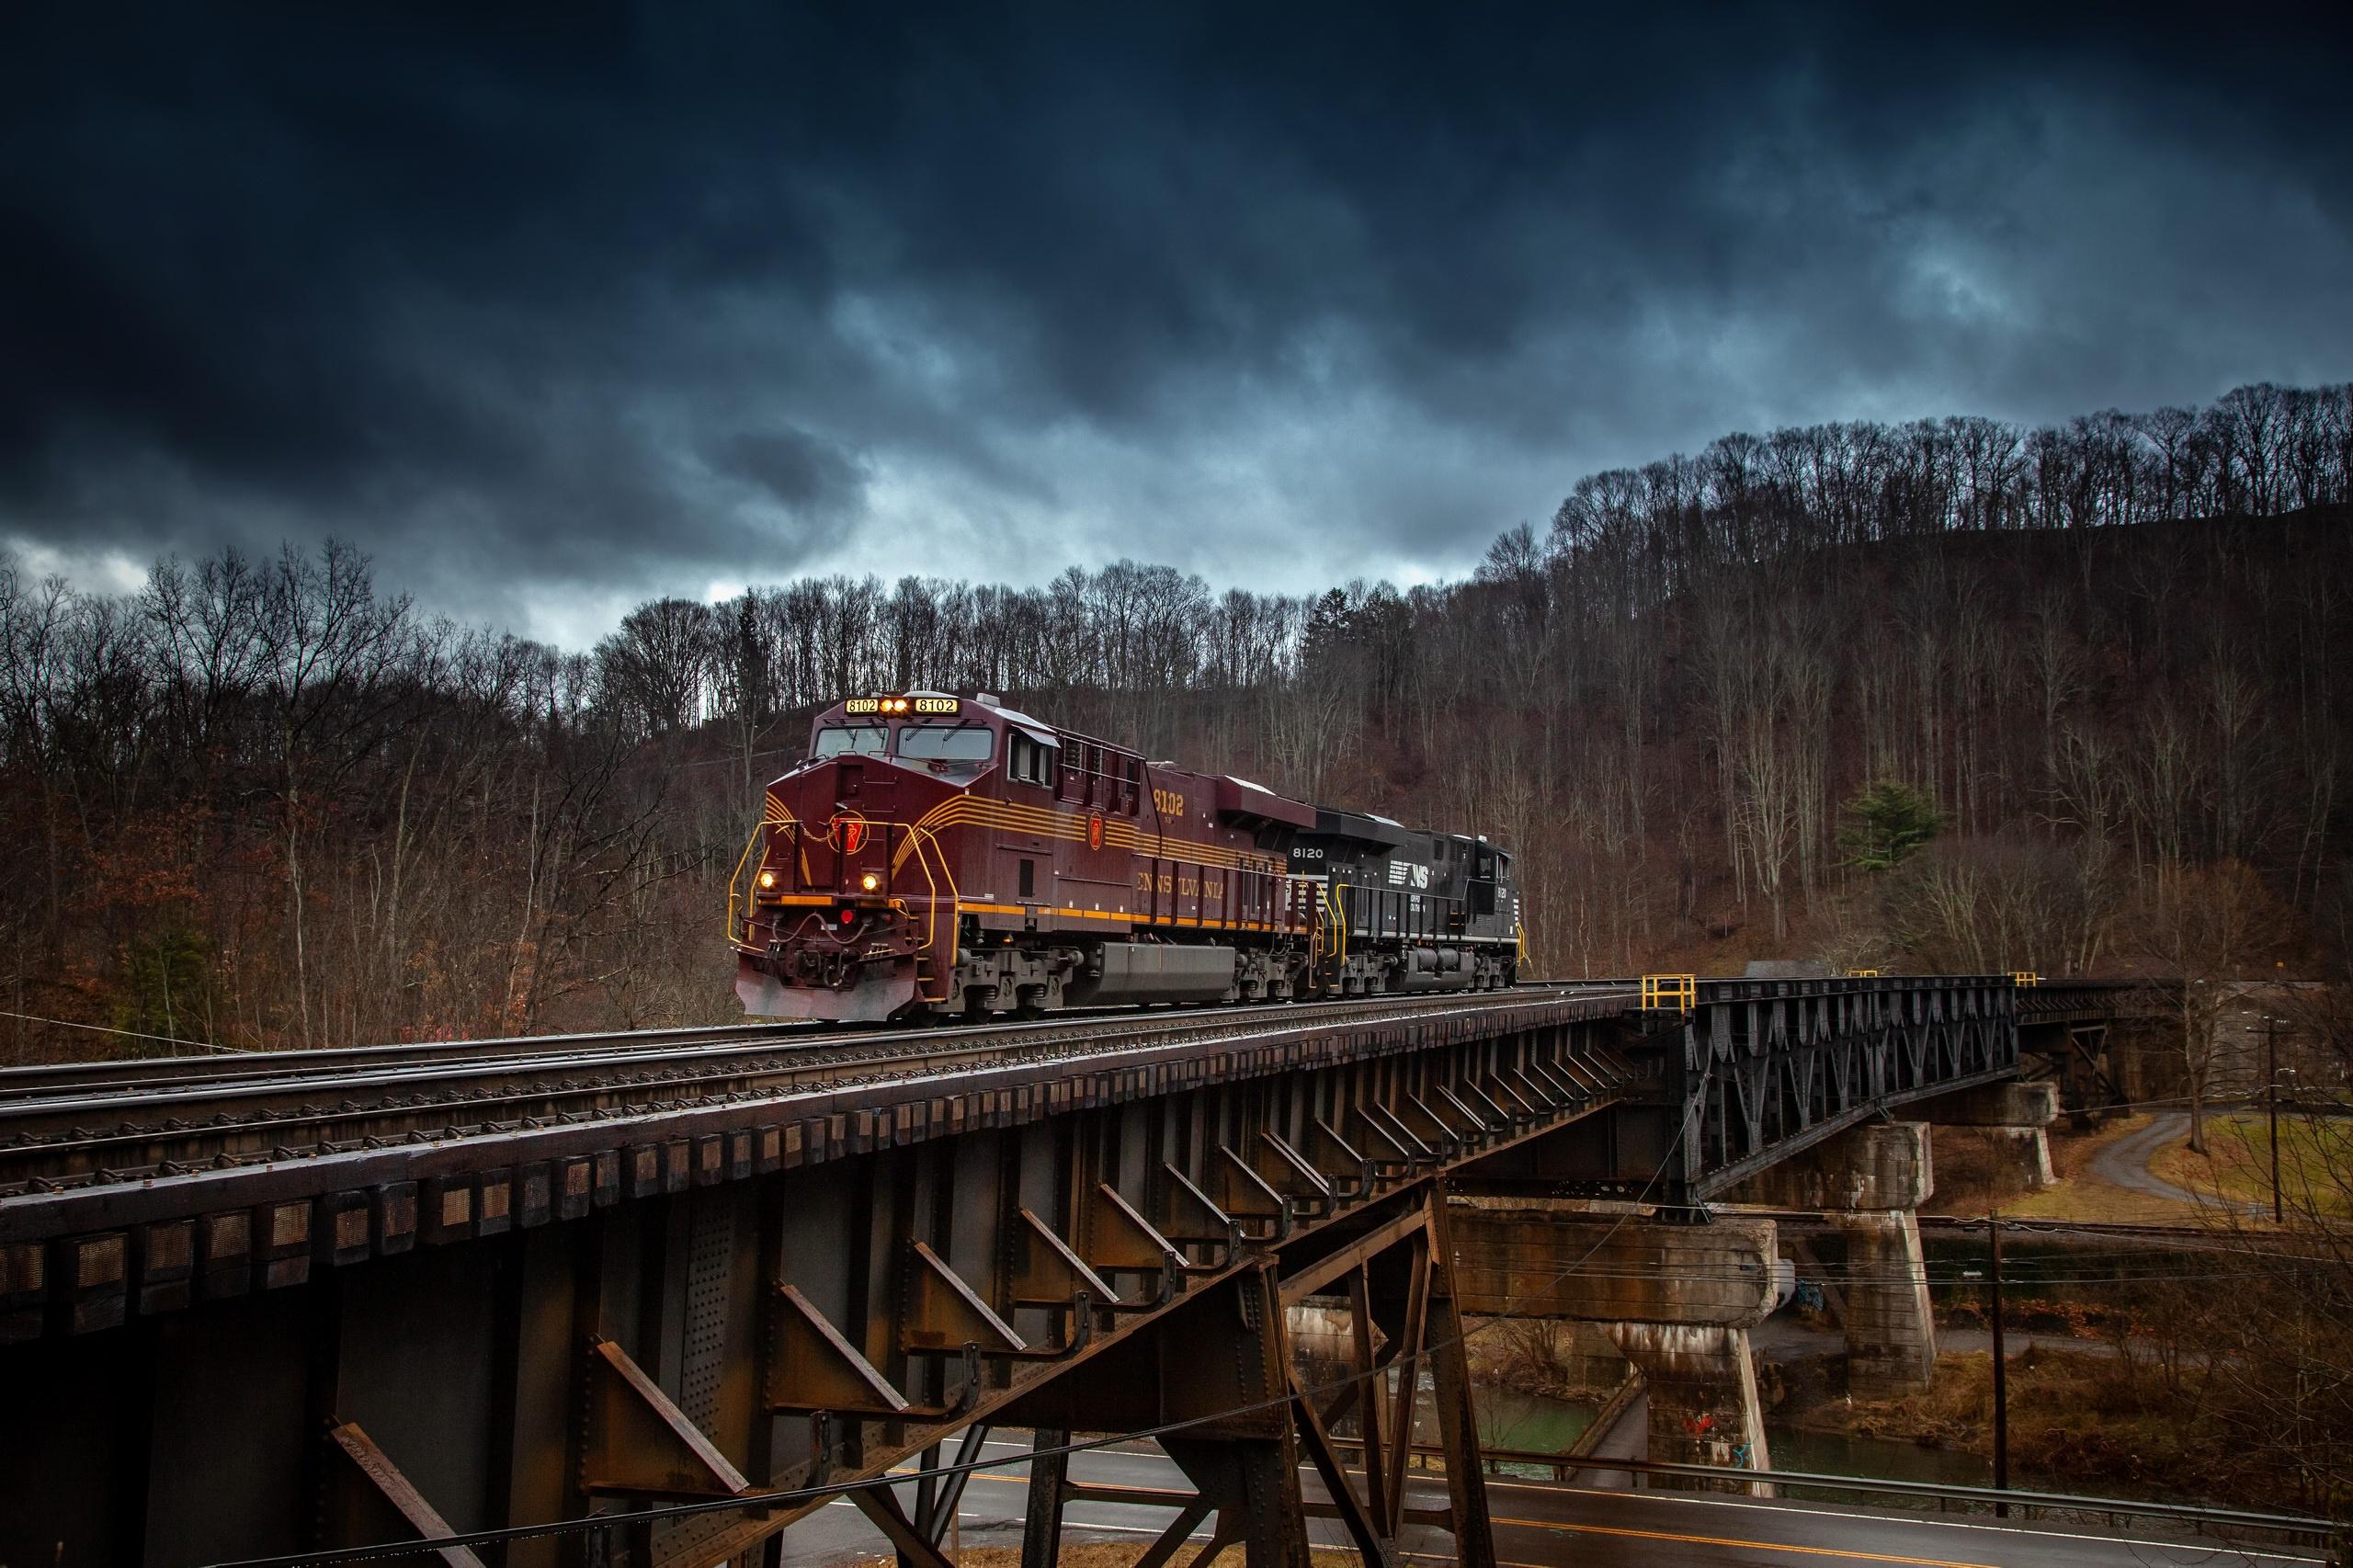 General 2560x1706 bridge locomotive train trees vehicle